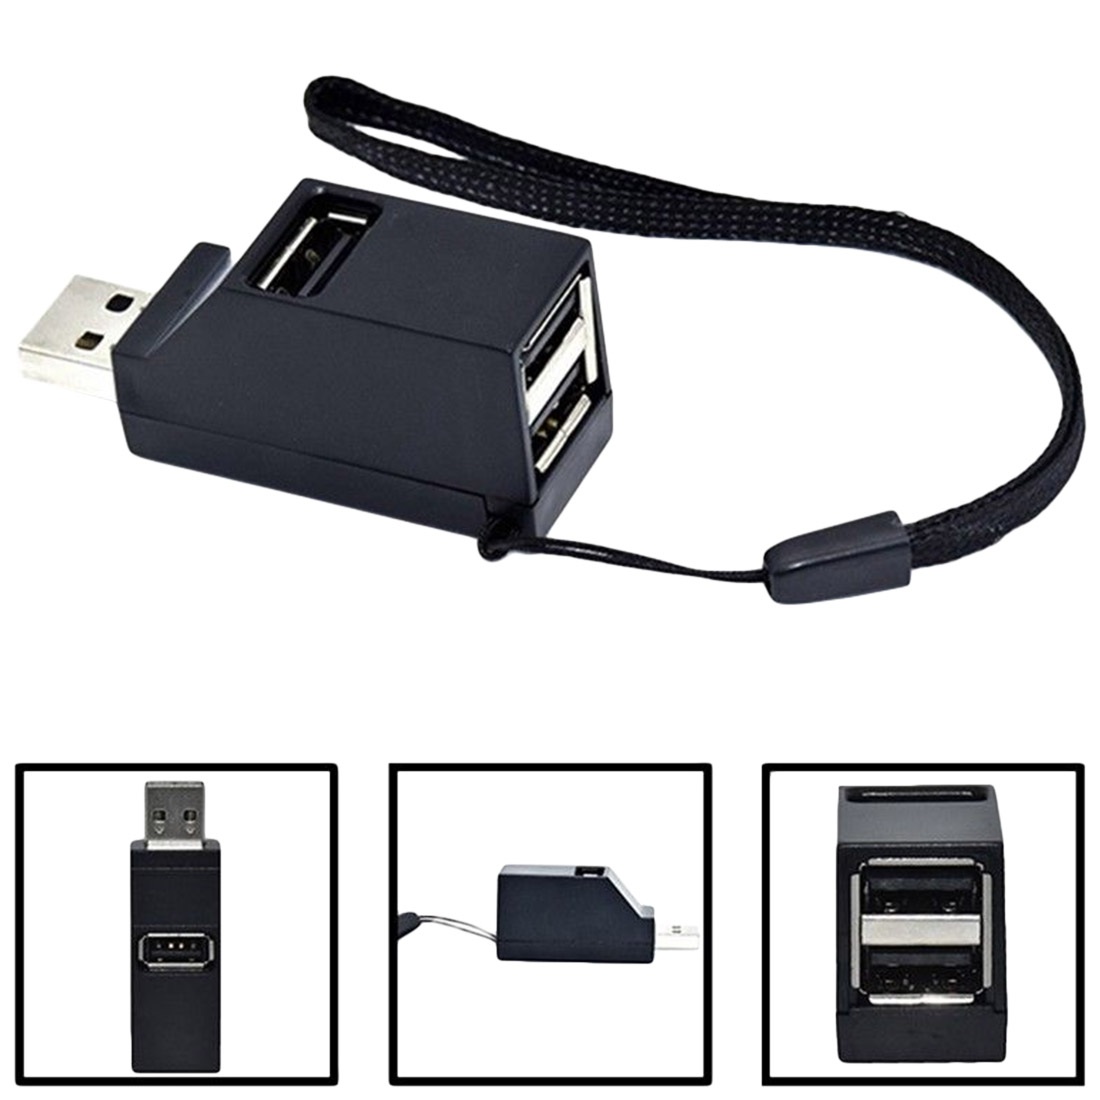 USB Hub Mini USB 2.0//3.0 Hi-Speed Multi Port USB Hub Splitter Hub Adapter for PC Computer for Portable Hard Drives